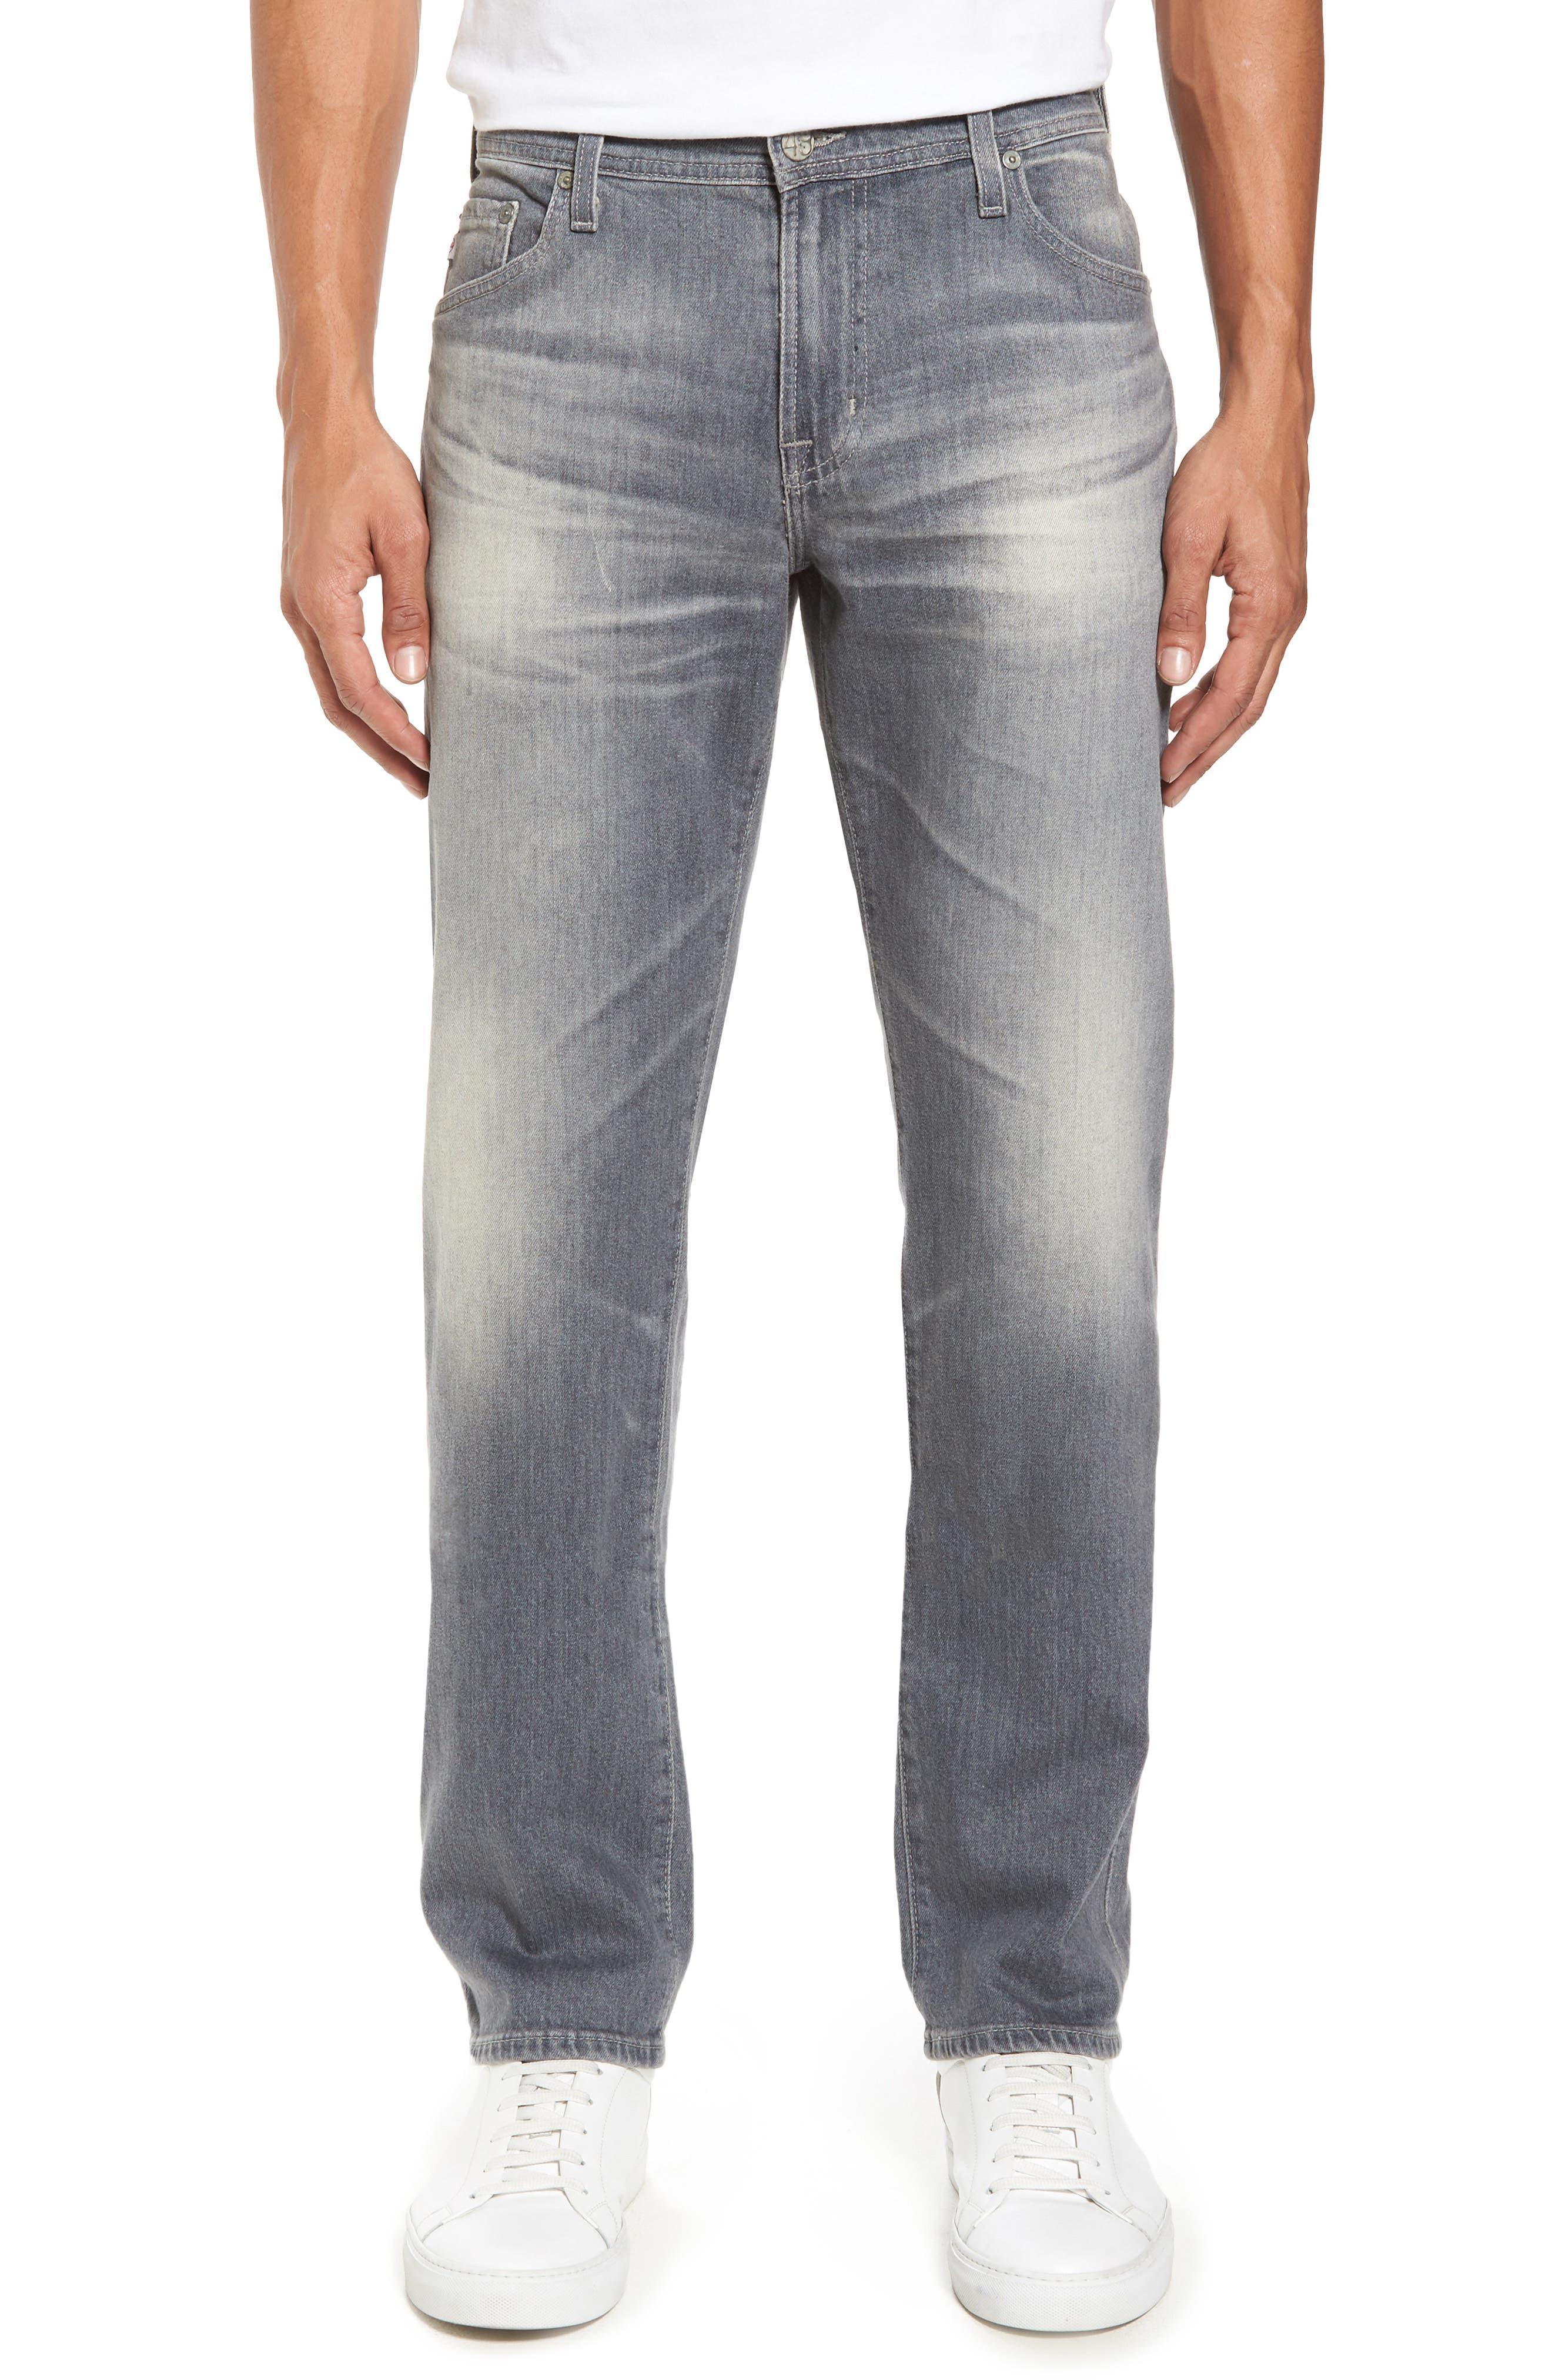 Graduate Slim Straight Fit Jeans,                             Main thumbnail 1, color,                             020